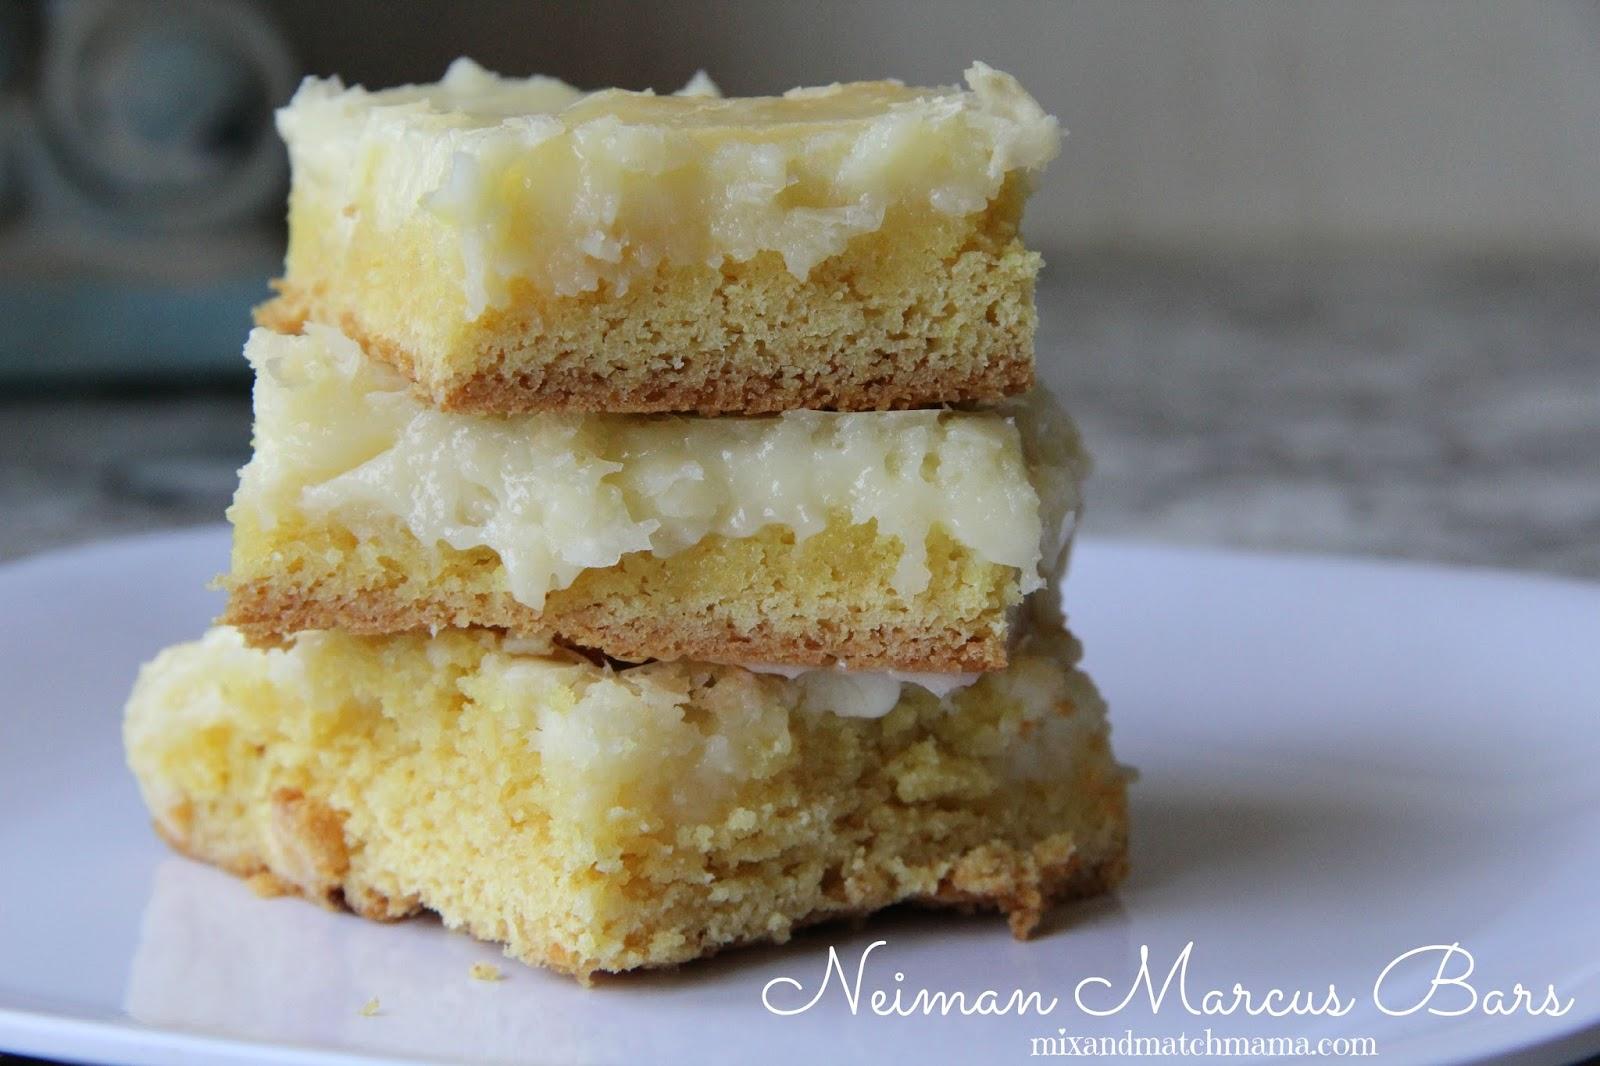 Neiman Marcus Butter Cake Recipe